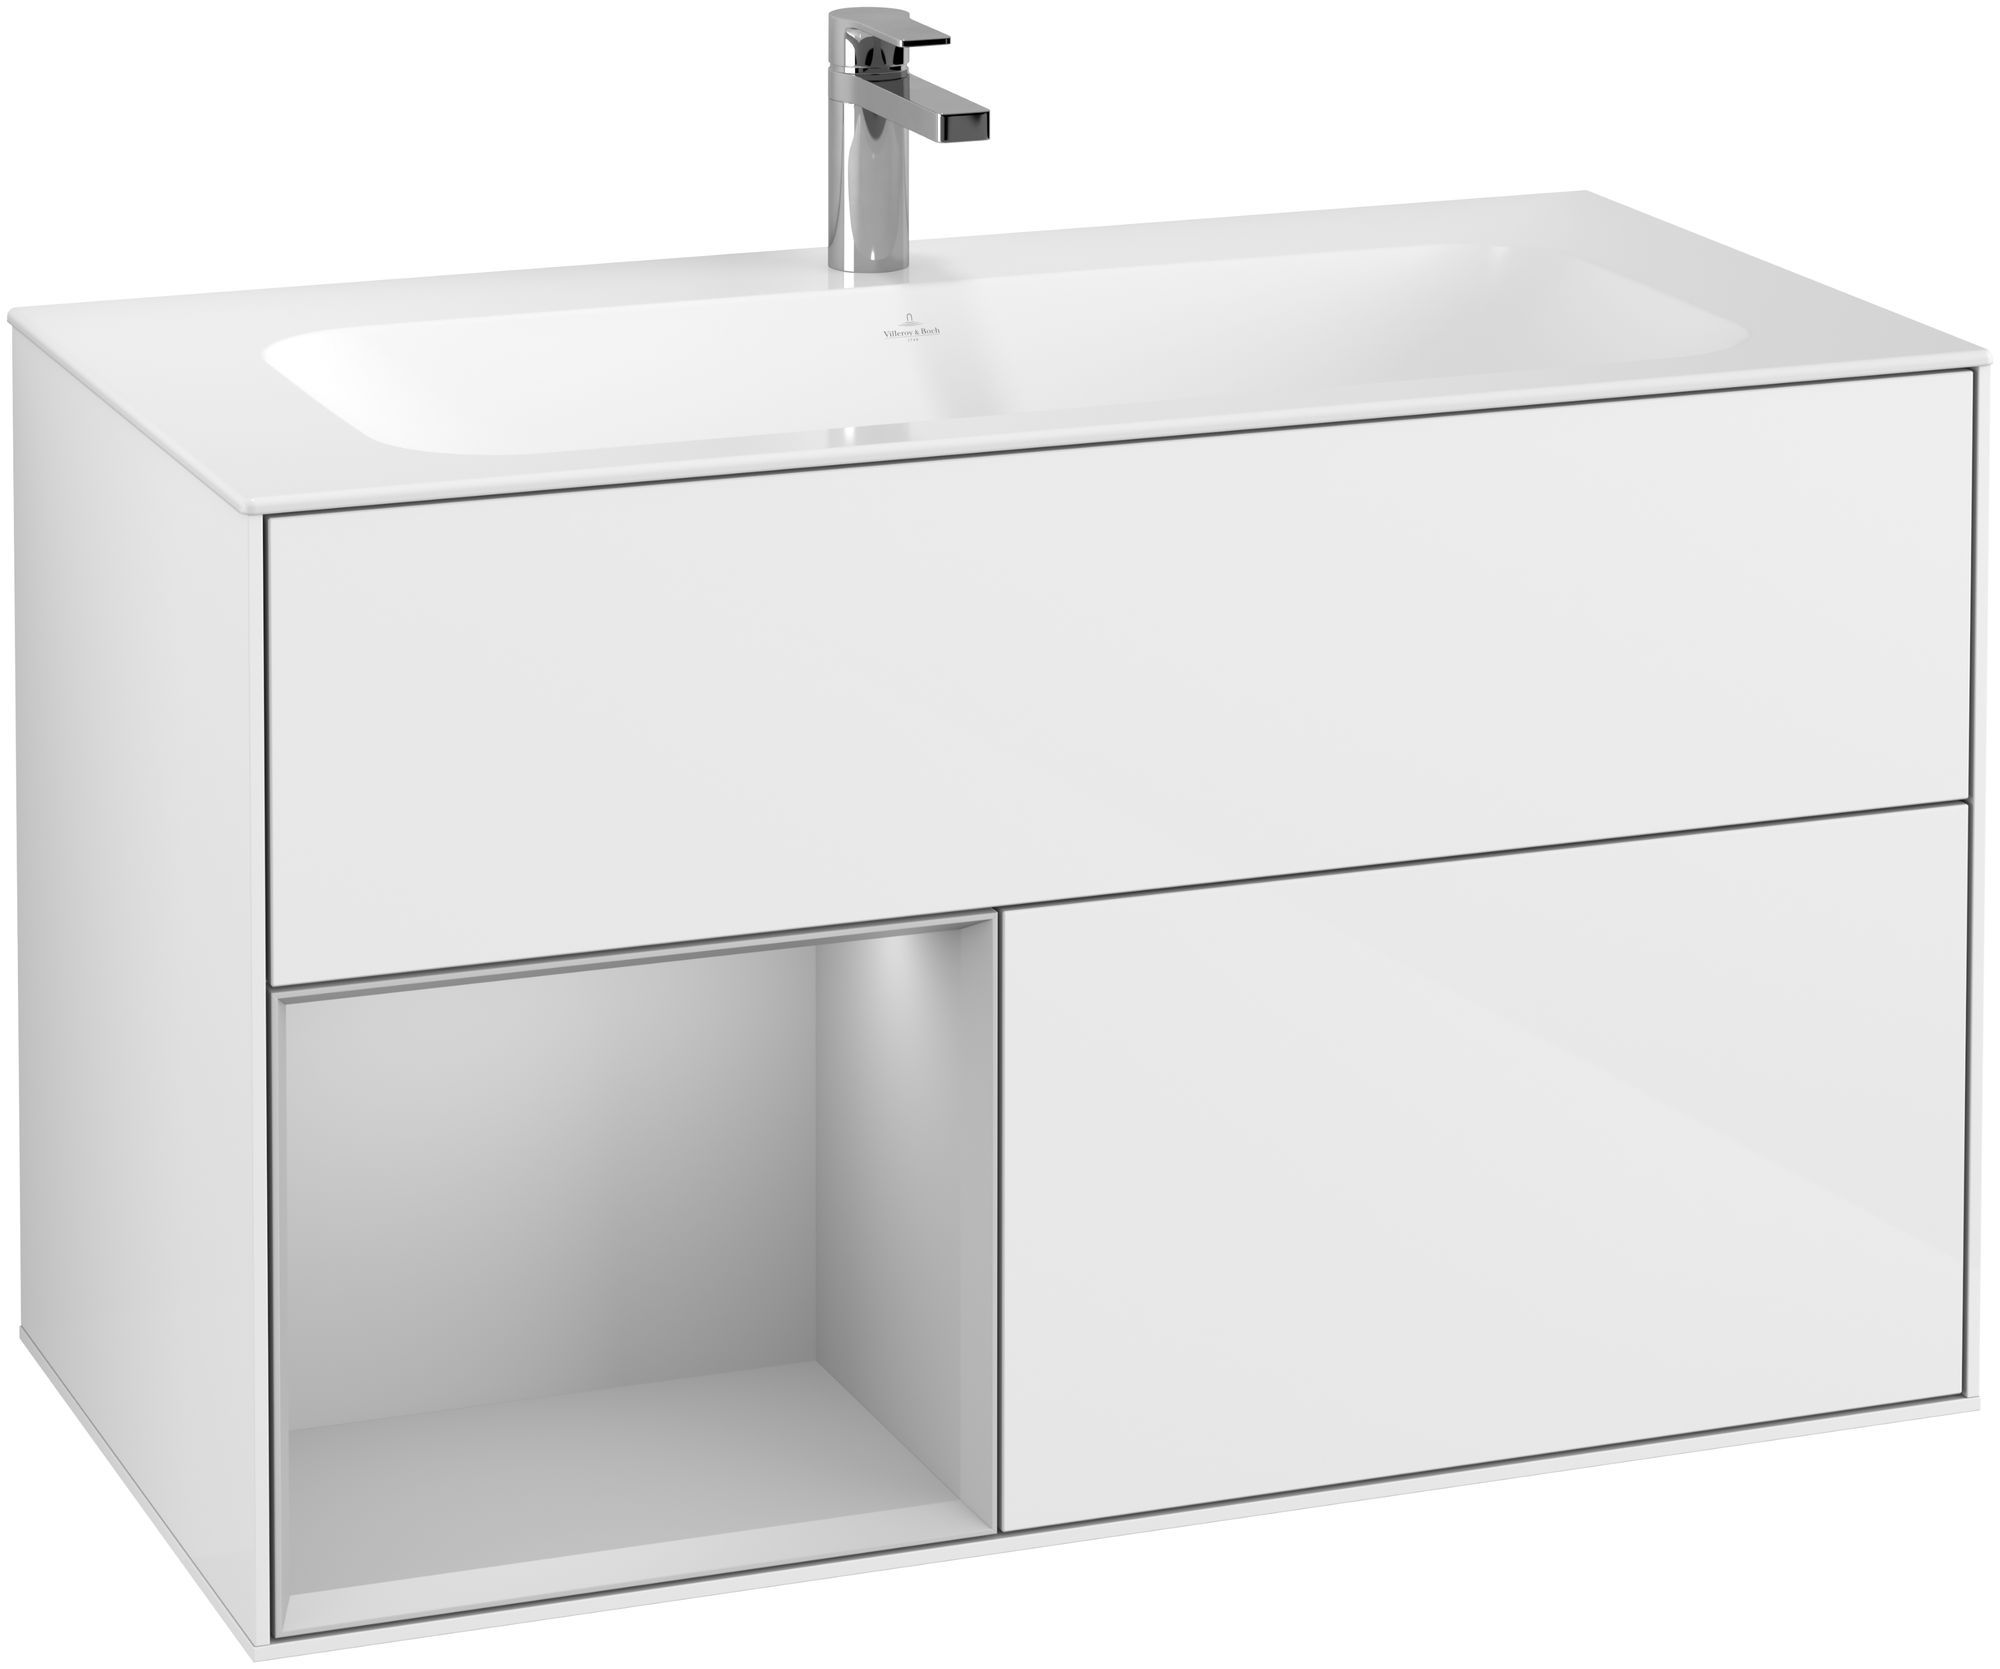 Villeroy & Boch Finion F03 Waschtischunterschrank mit Regalelement 2 Auszüge LED-Beleuchtung B:99,6xH:59,1xT:49,8cm Front, Korpus: Glossy White Lack, Regal: Light Grey Matt F030GJGF